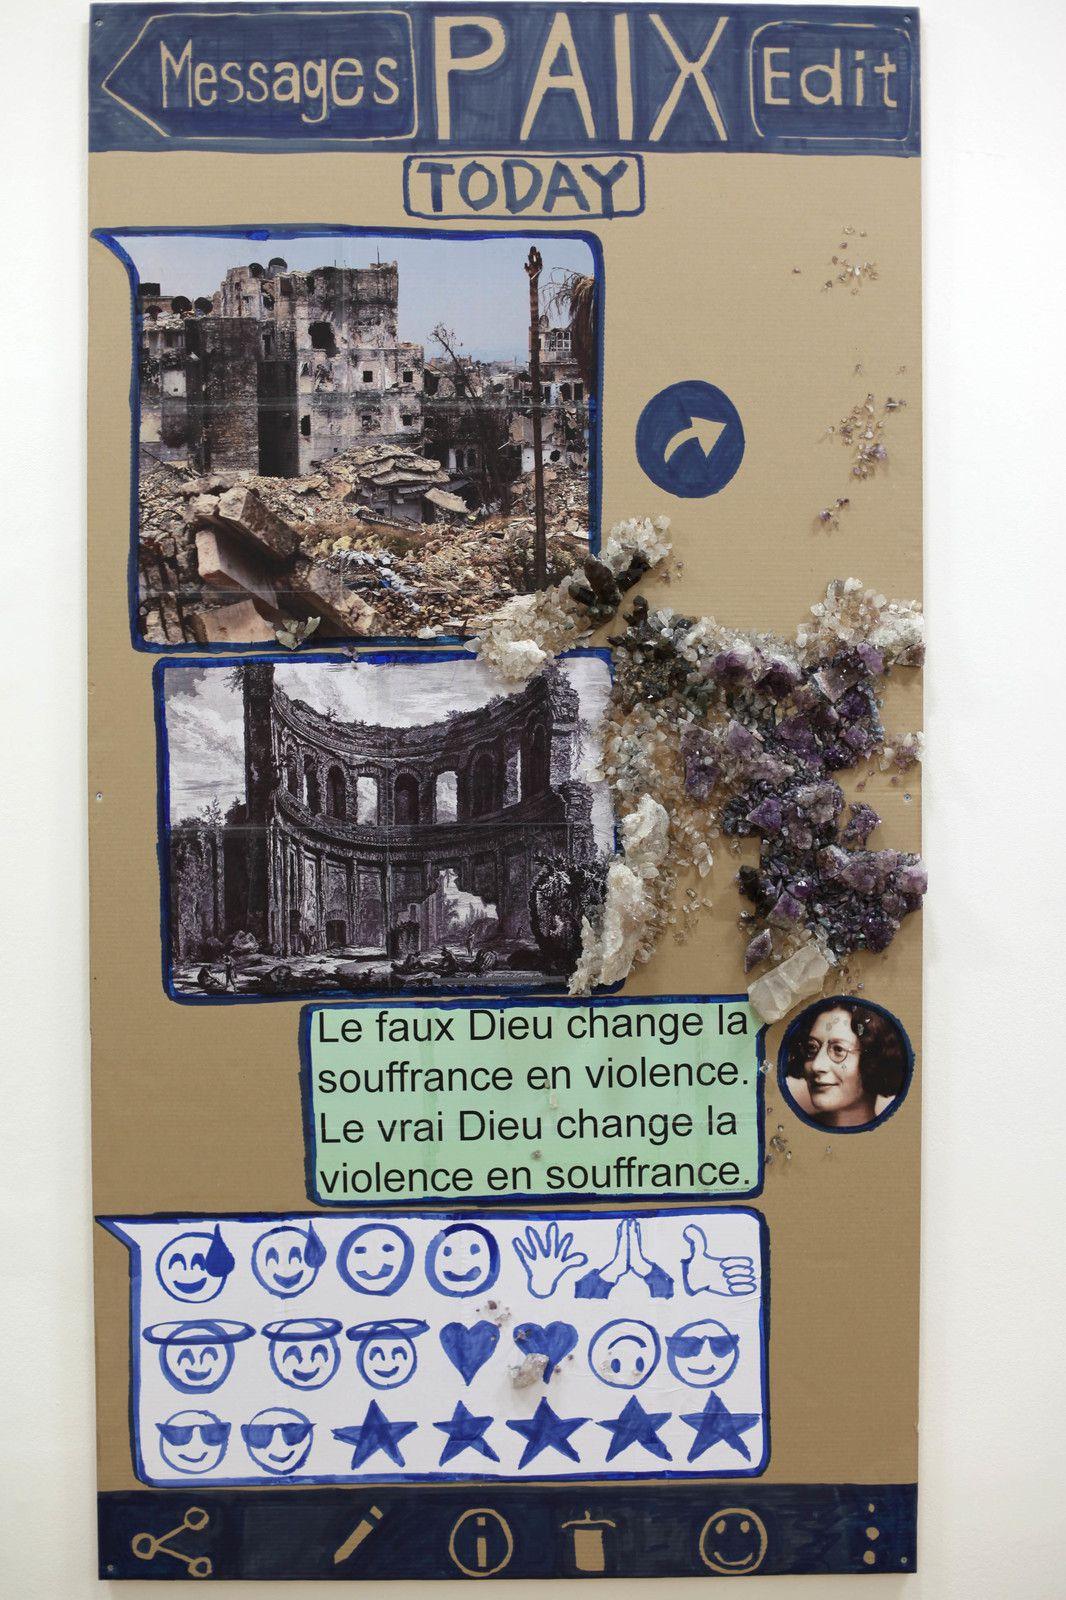 """Paix (Chat - poster)"", 2020 de Thomas HIRSCHHORN - Courtesy Galerie Chantal Crousel @ Photo Éric Simon"